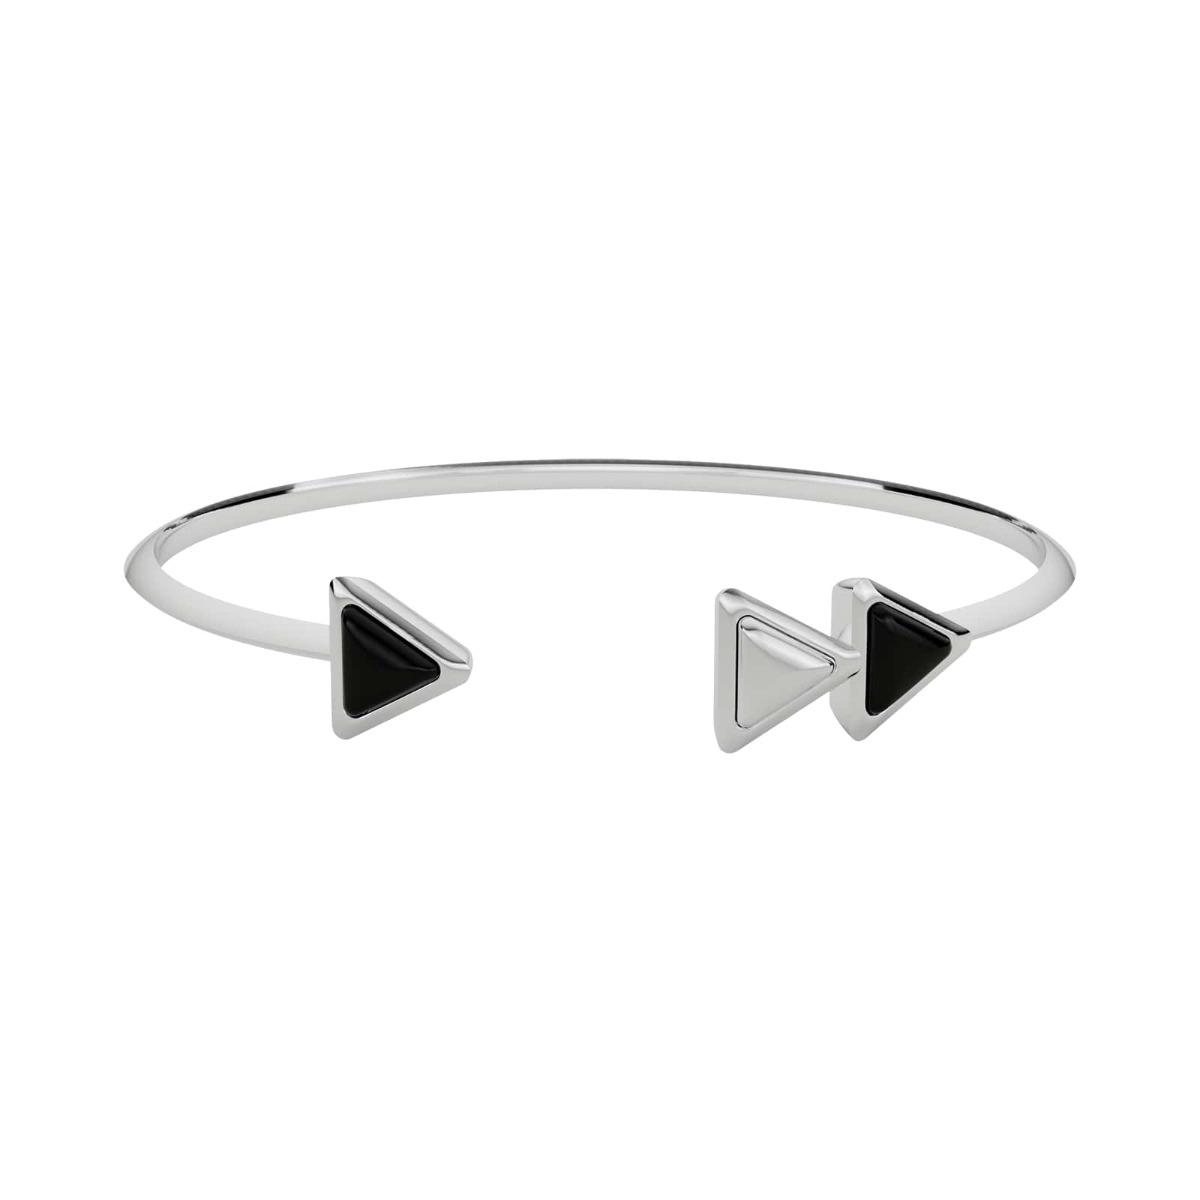 Bracelet Dove Vai Forward Gem White Gold Onix